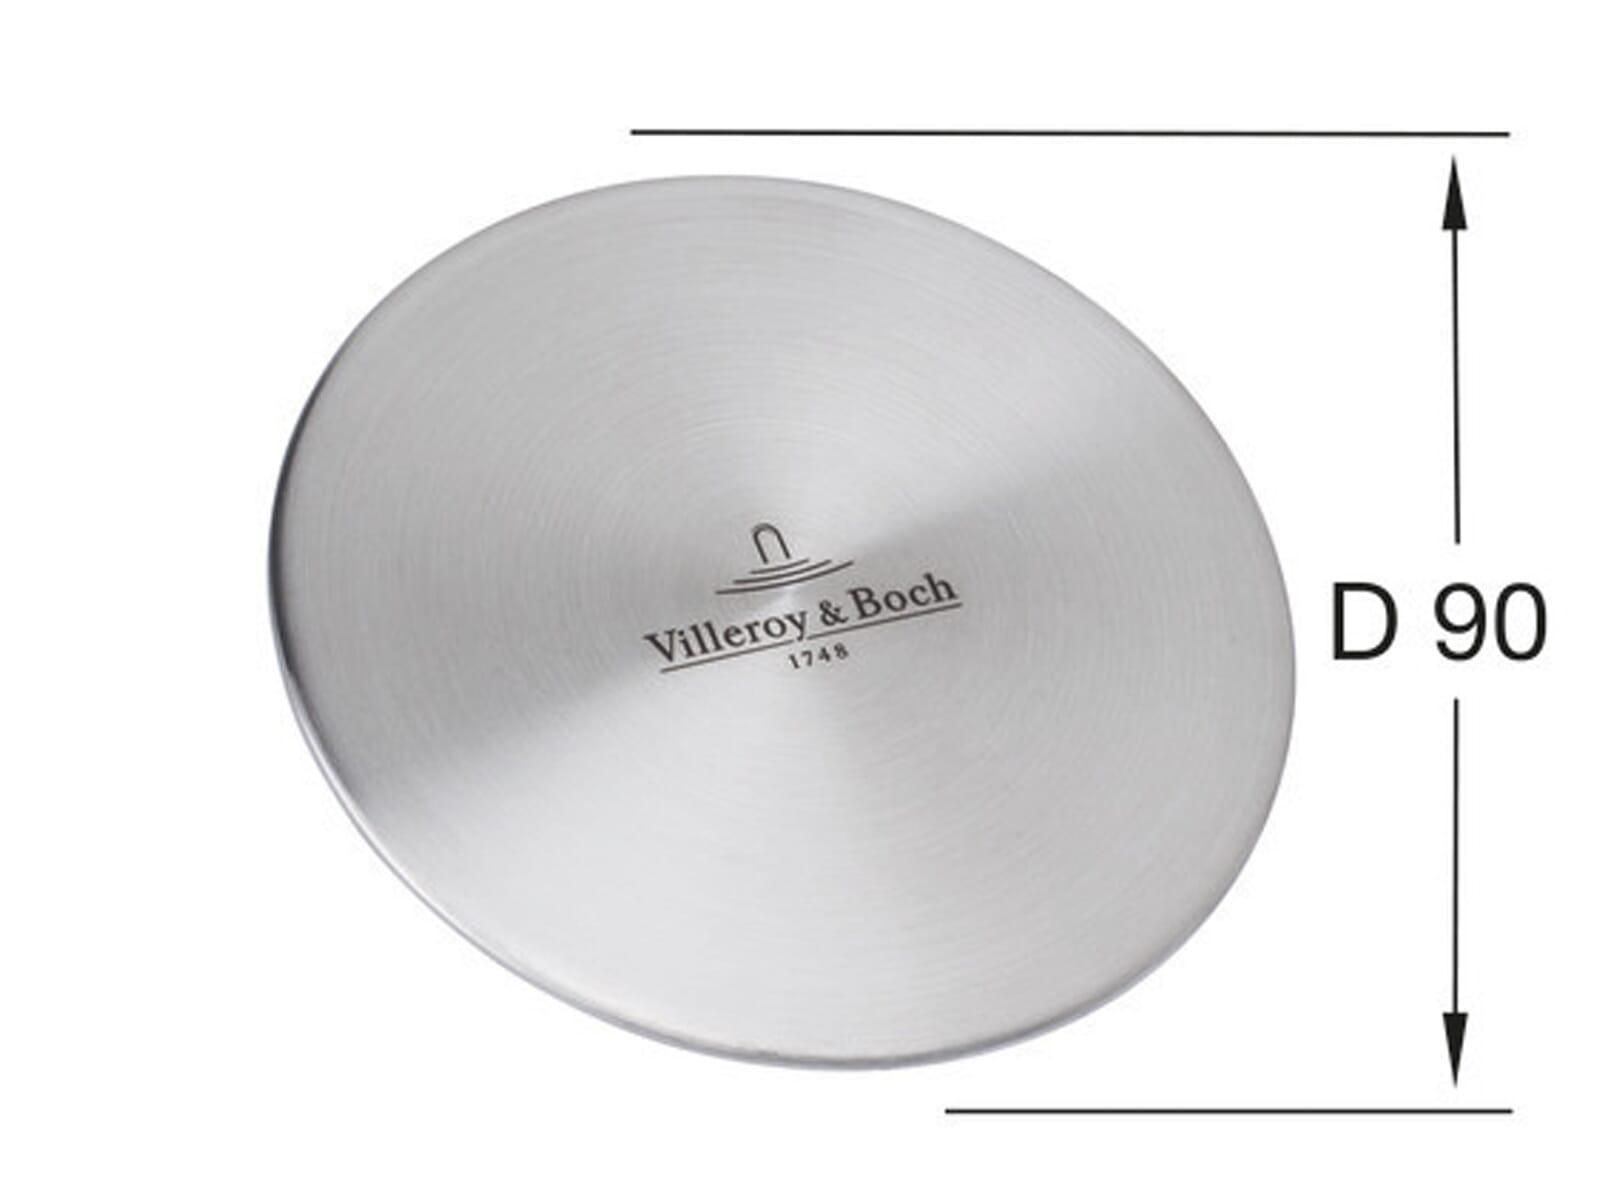 Villeroy & Boch 9624 15 LC Cap Ventilabdeckung Edelstahl